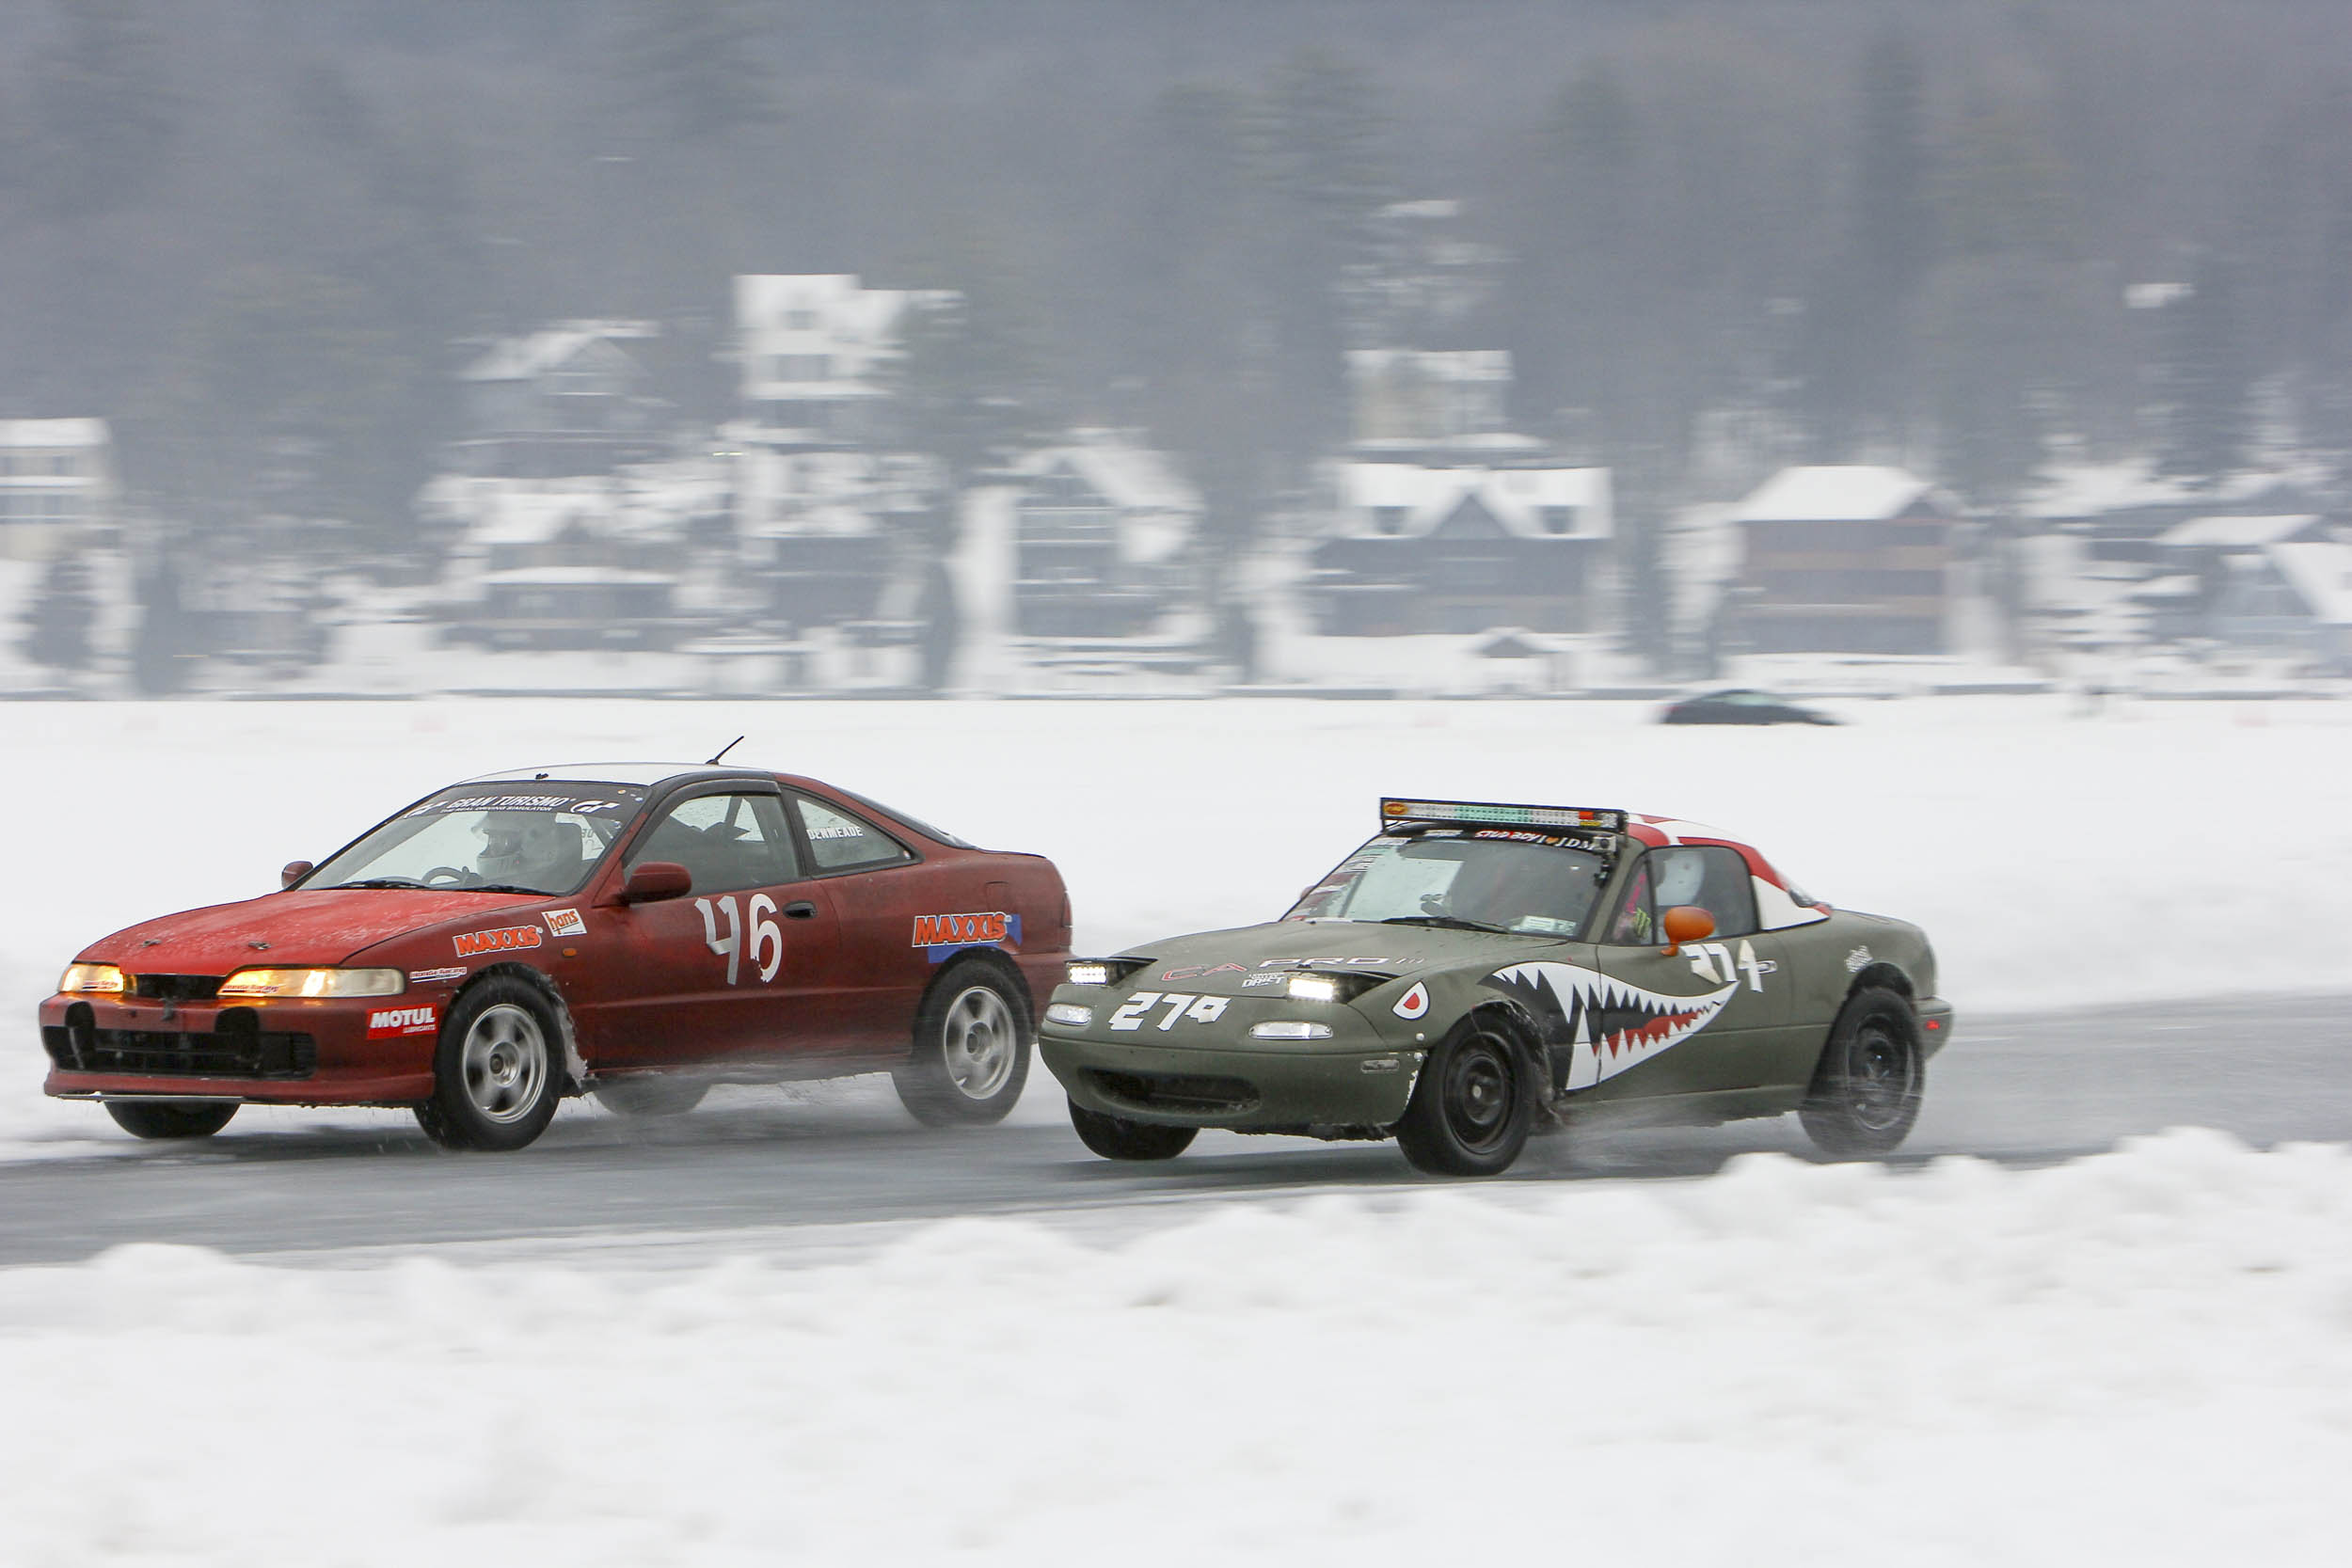 ice racing miata